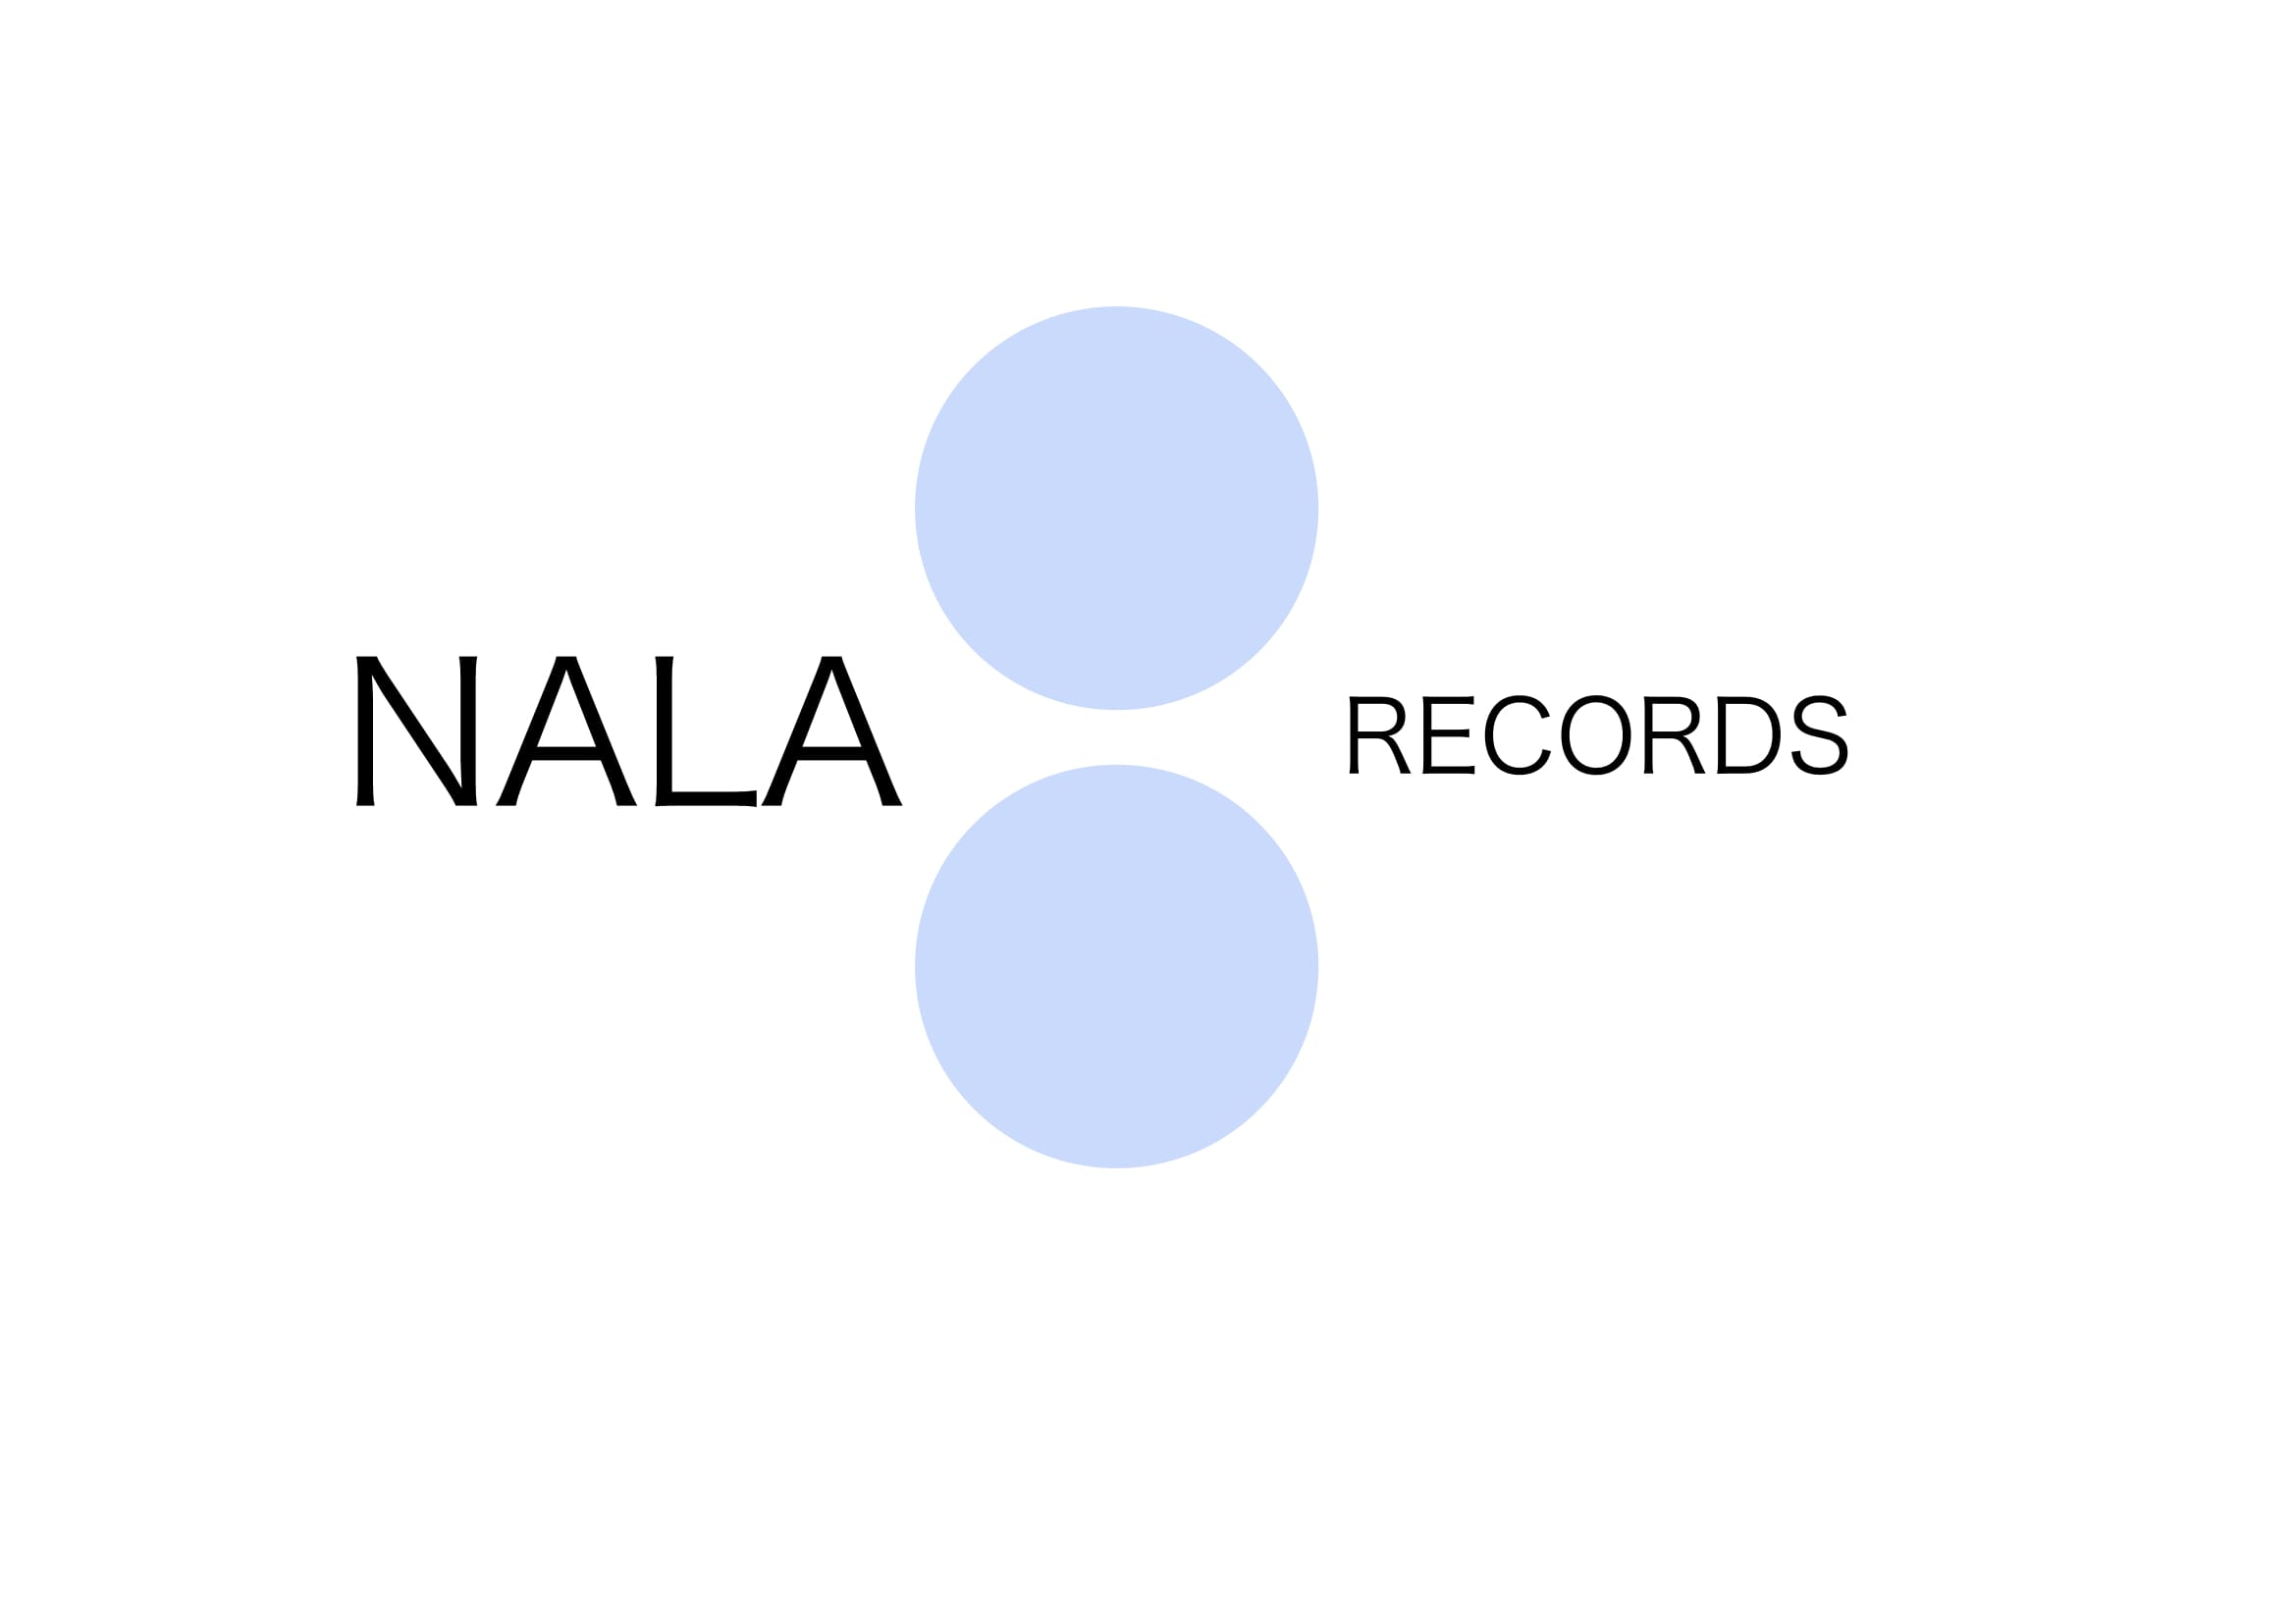 NALA Records